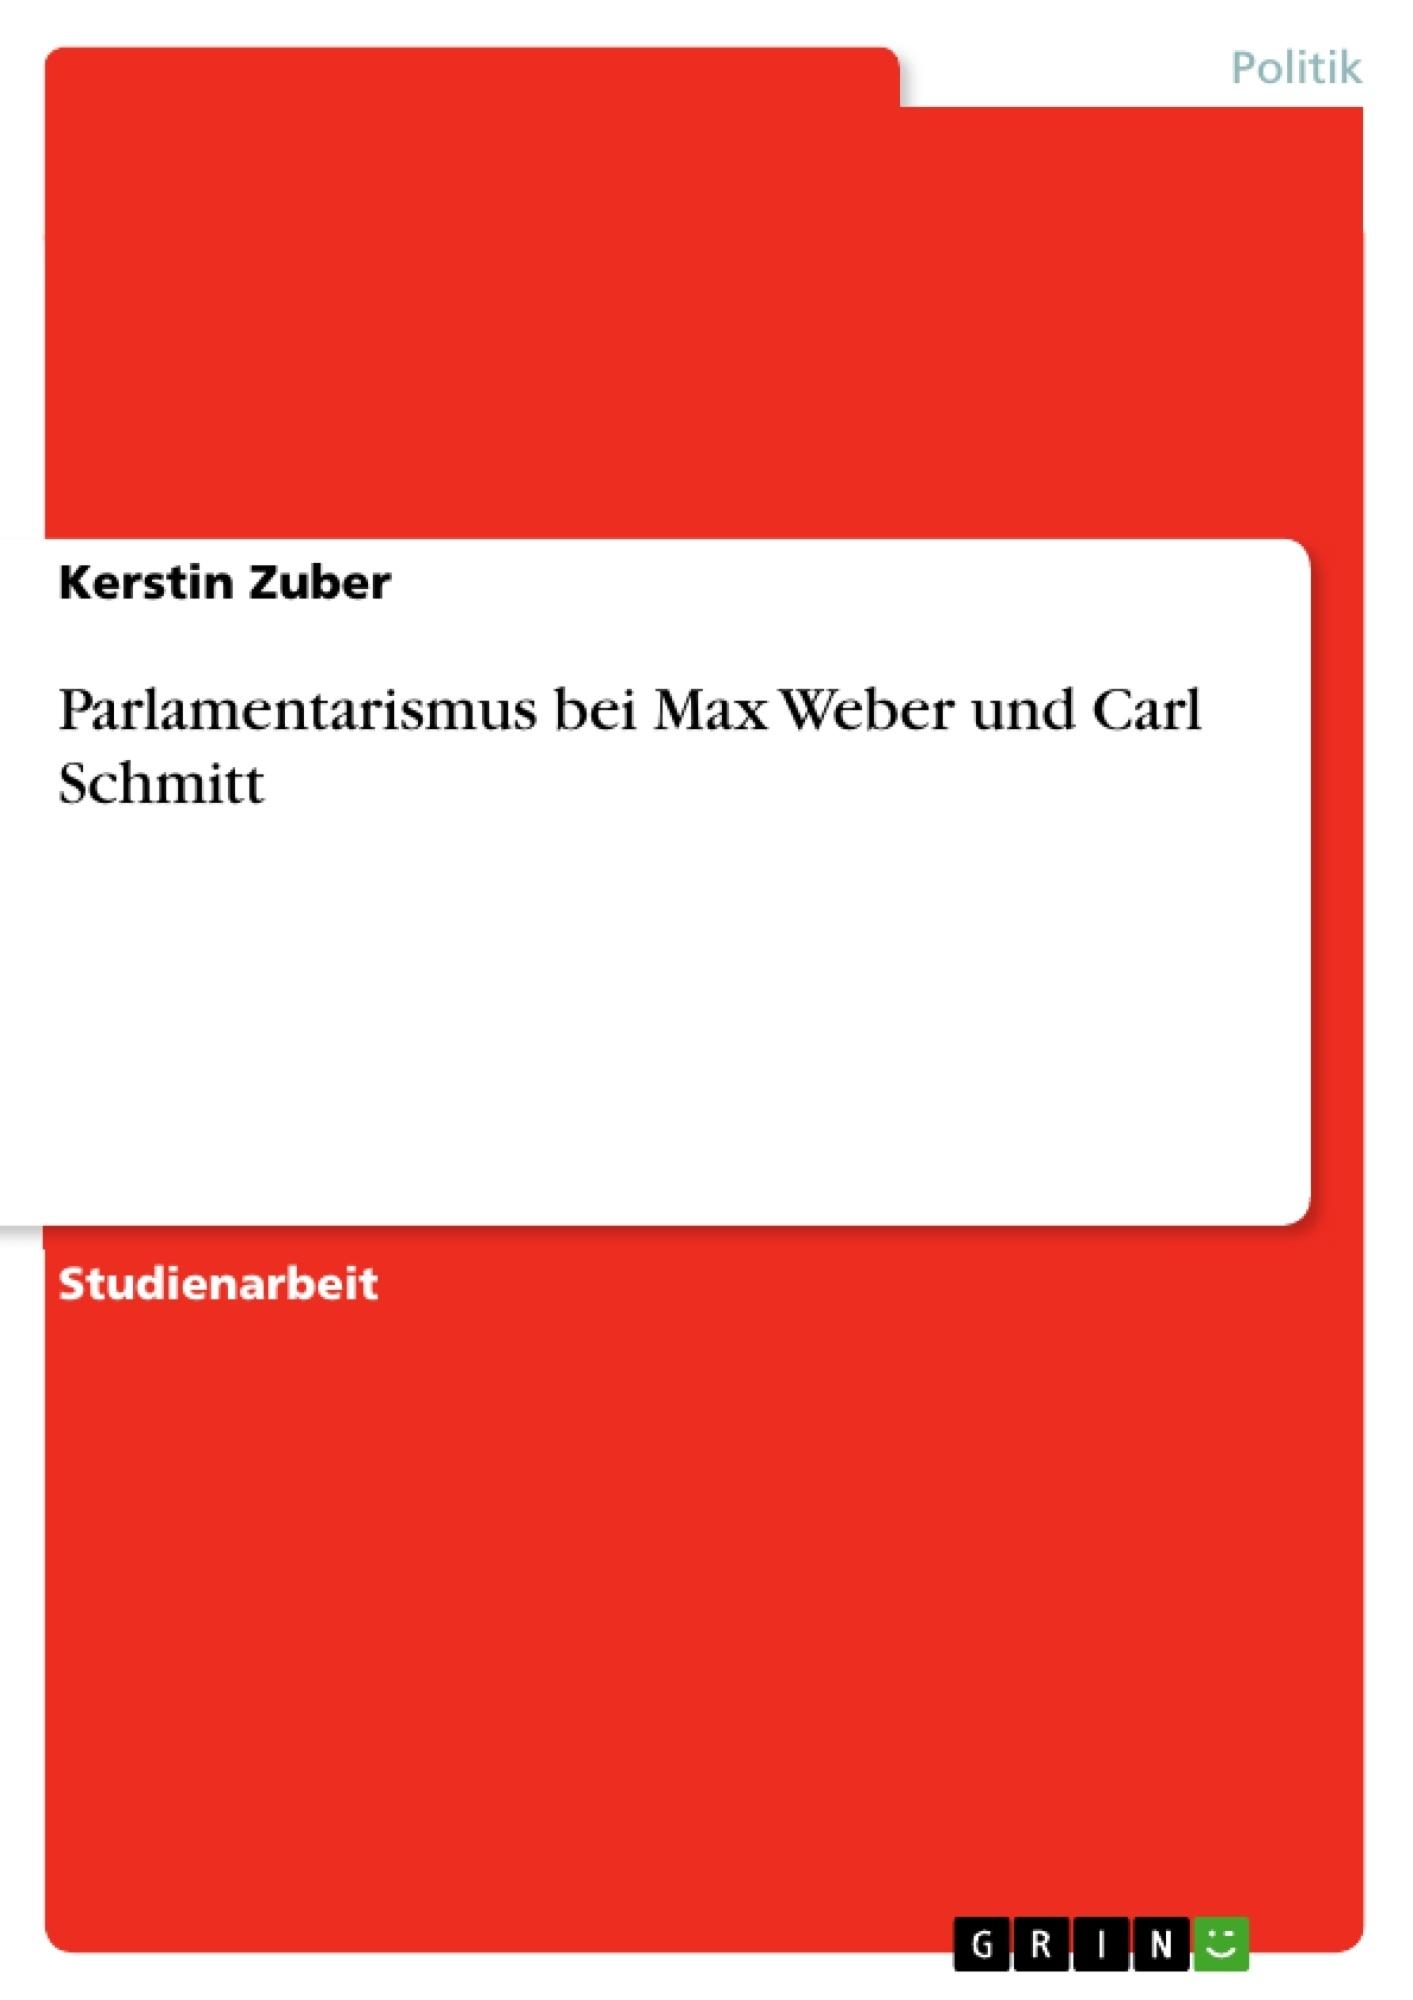 Titel: Parlamentarismus bei Max Weber und Carl Schmitt